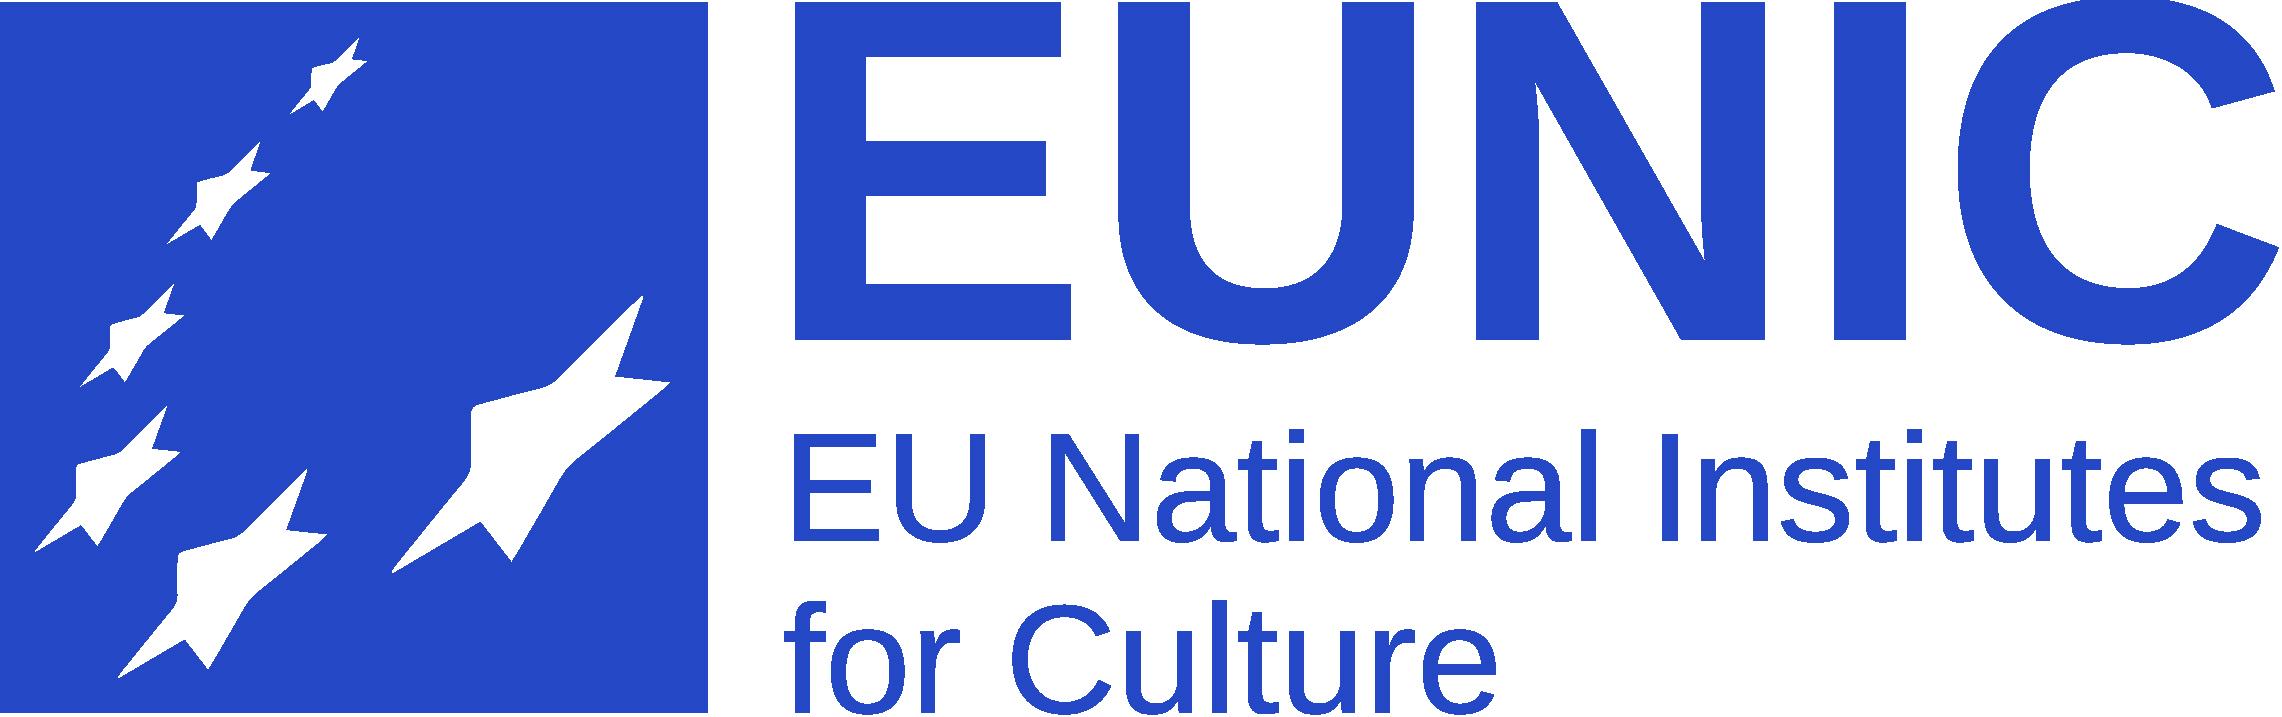 EU National Institutes for Culture